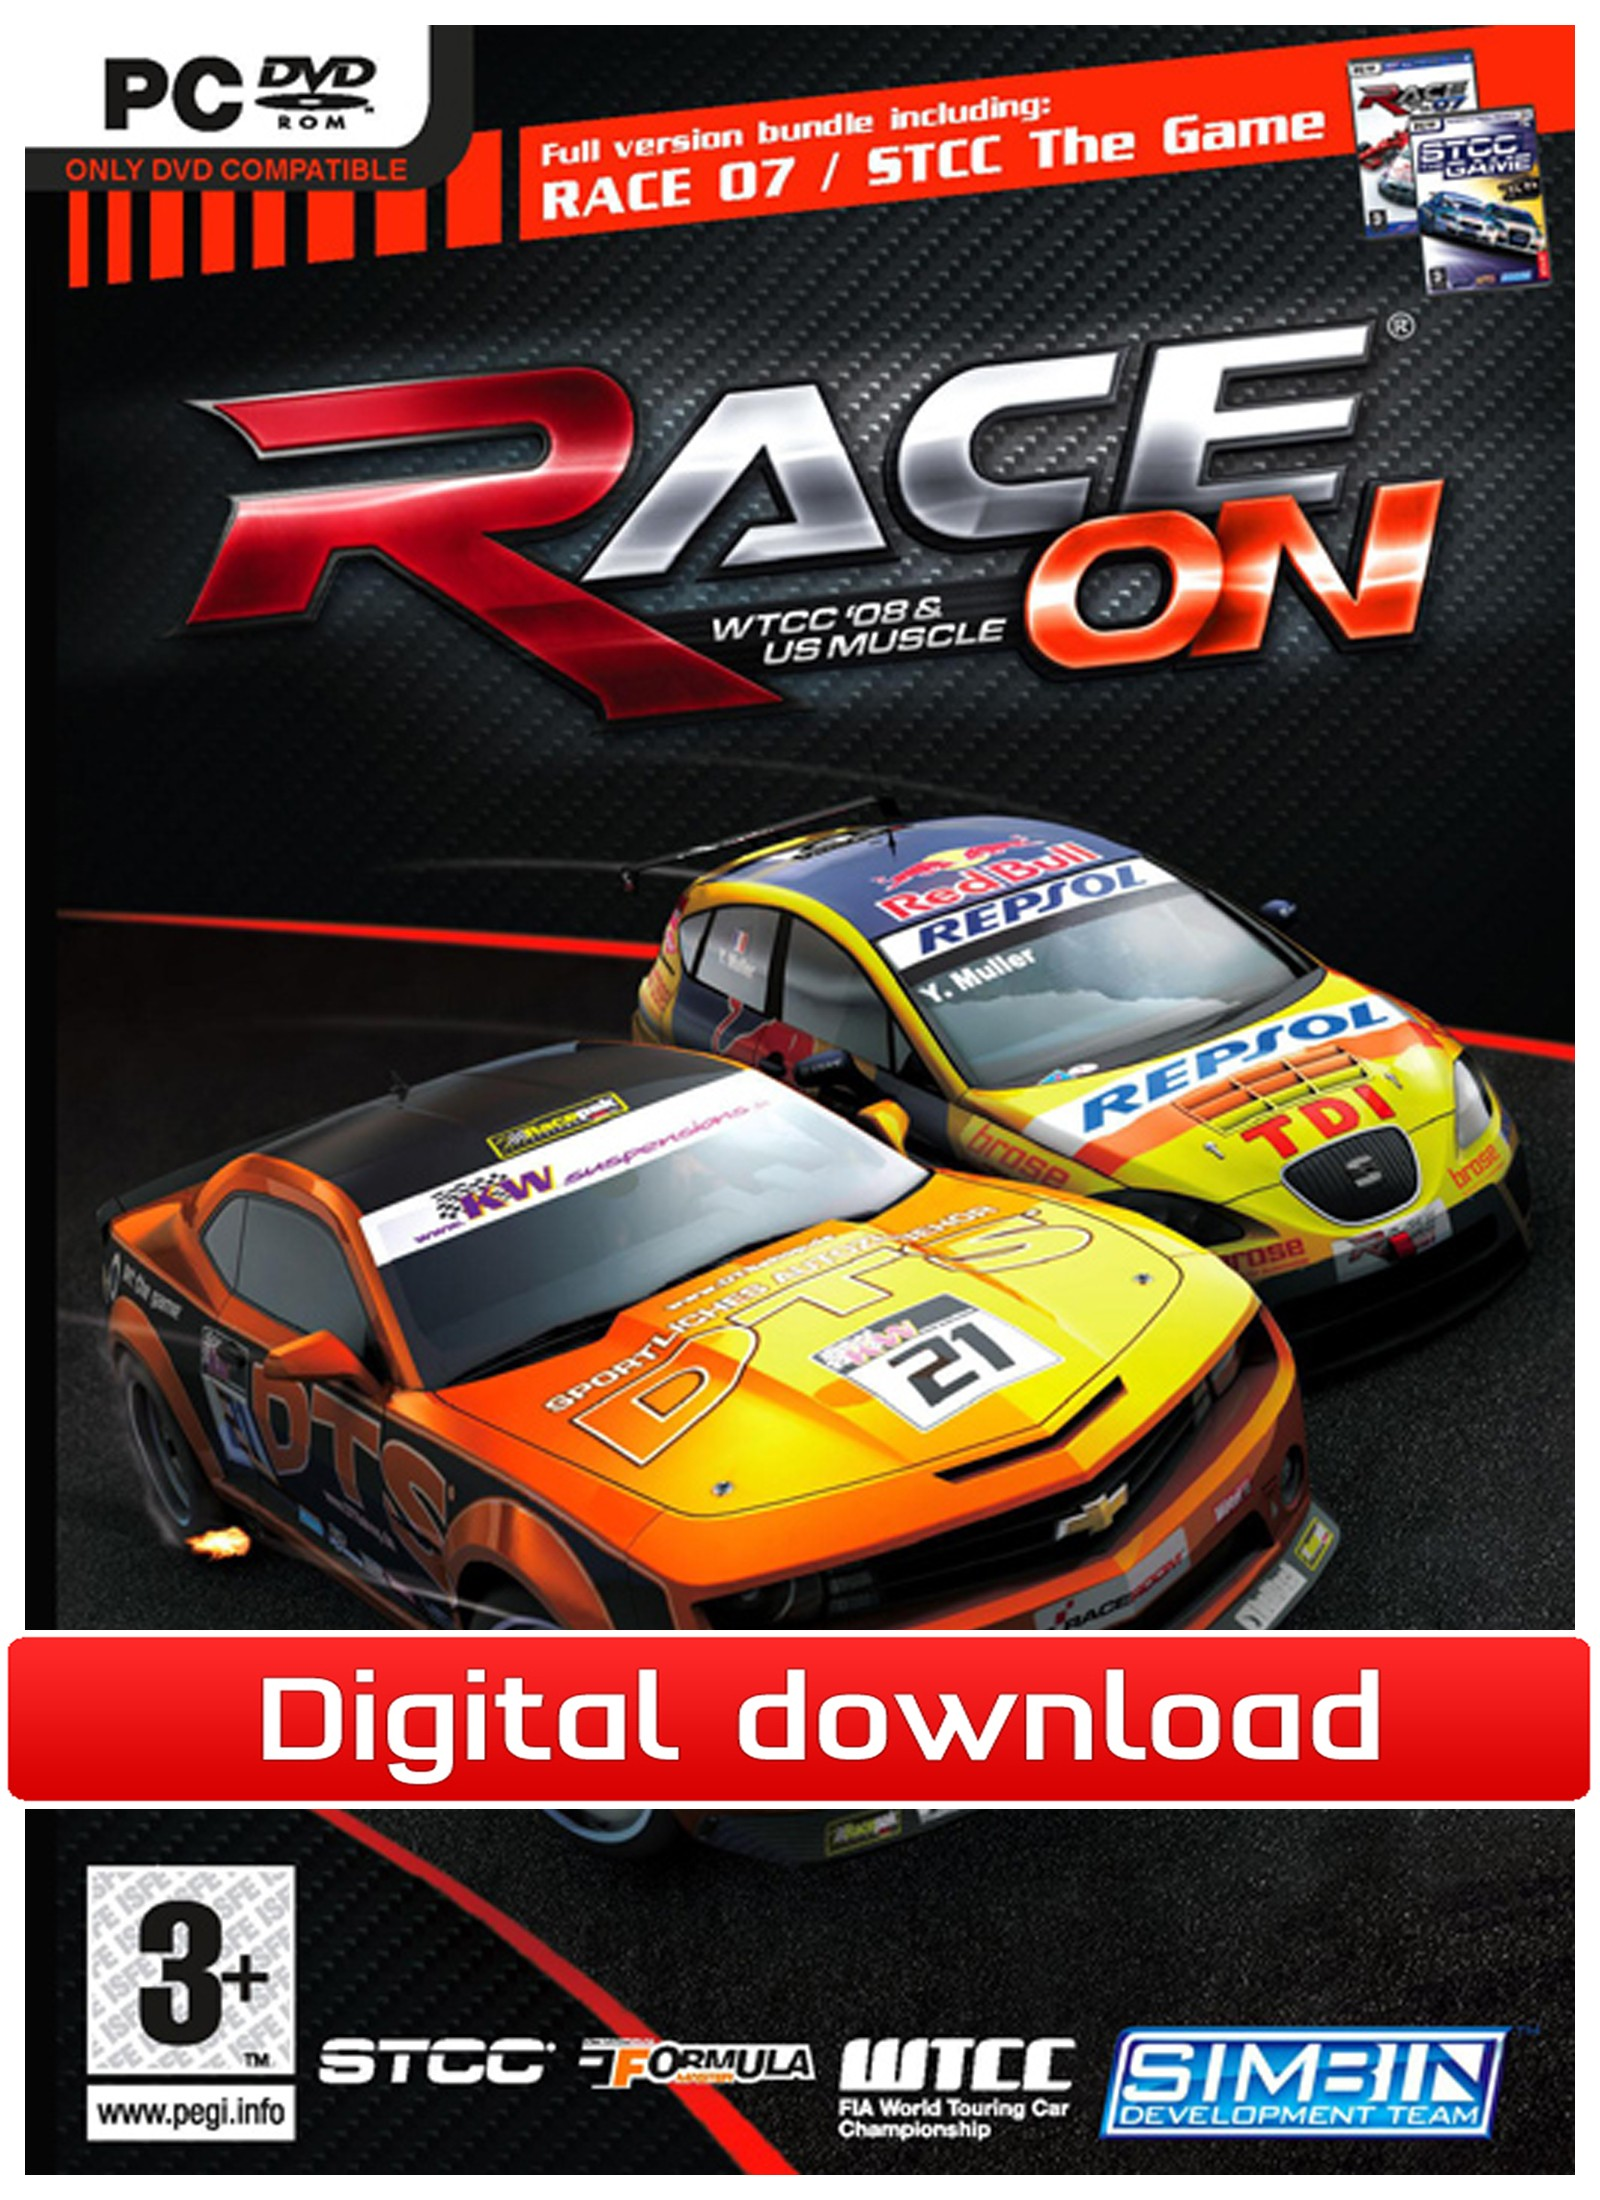 RACE On (PC nedlastning) PCDD28529